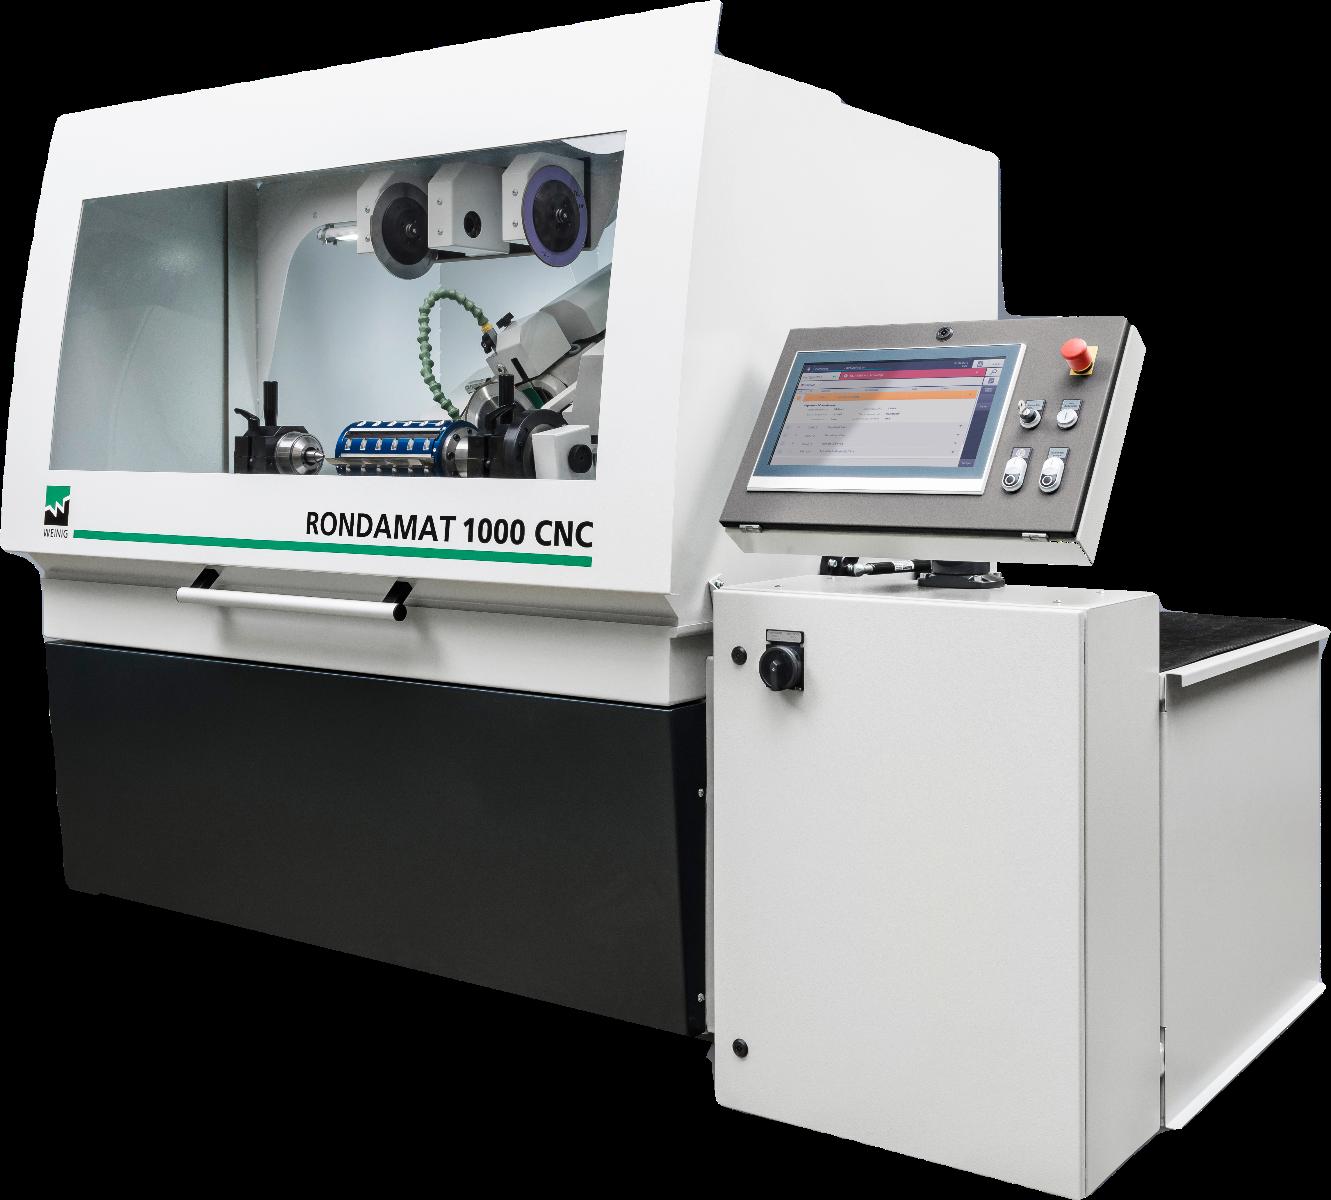 Weinig Rondamat 1000 CNC gereedschapslijpmachine